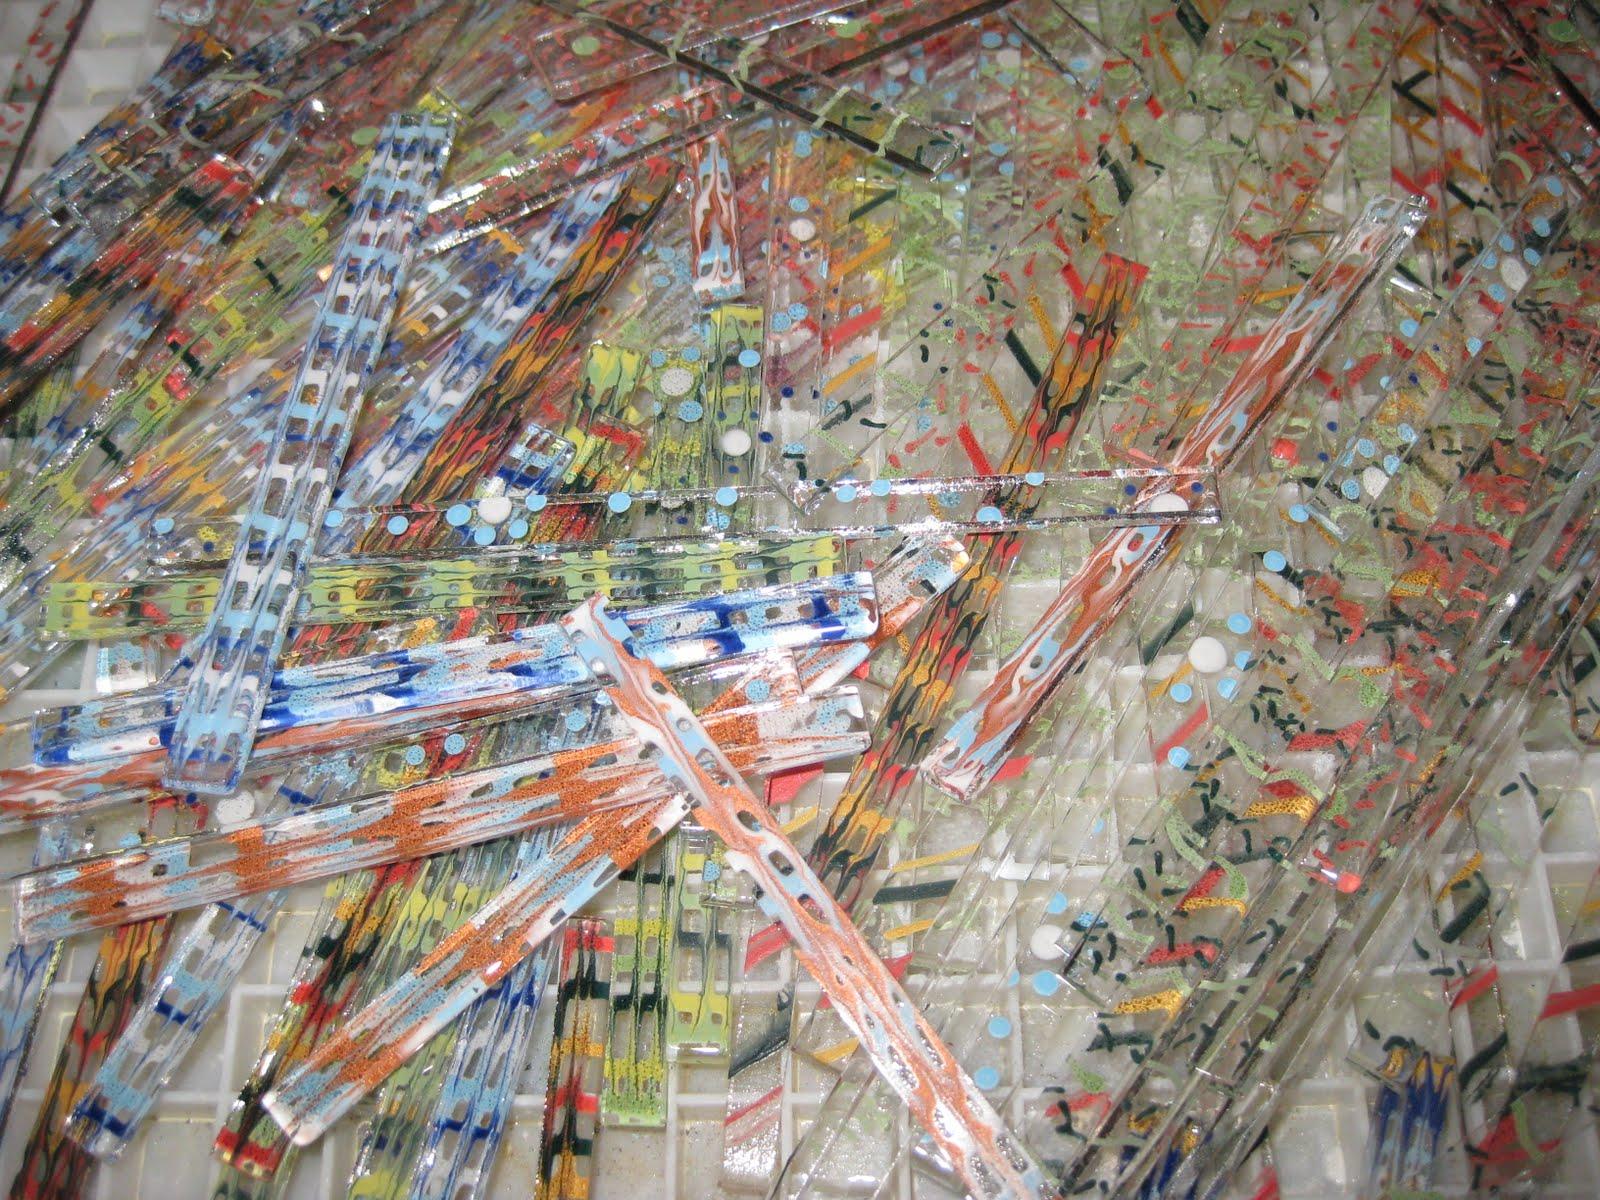 Calyx Glass Blog: Glassline Paints on Clear Glass